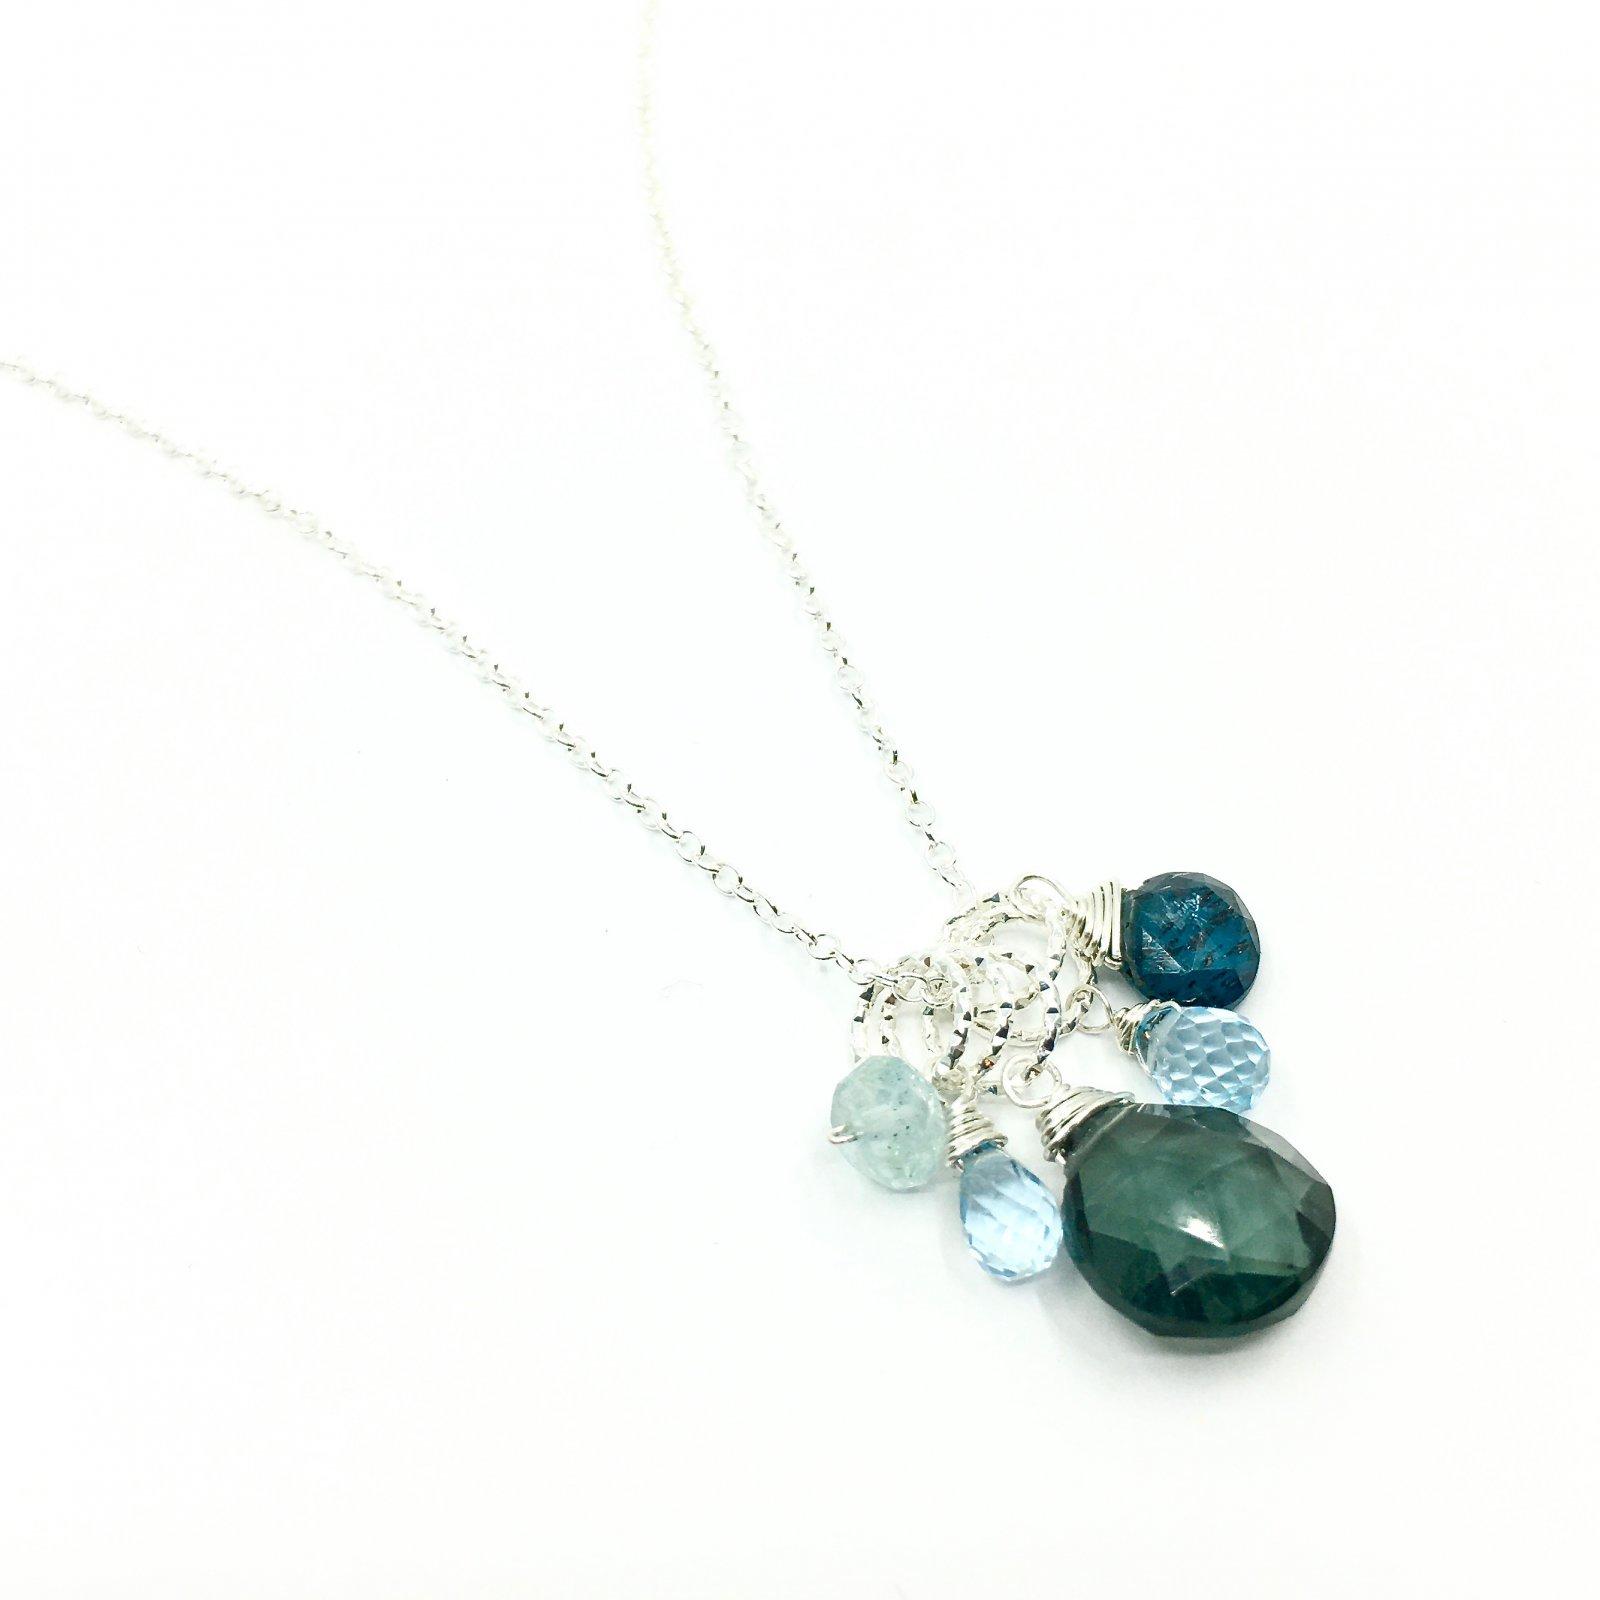 Kristin Ford Gemstone Necklace